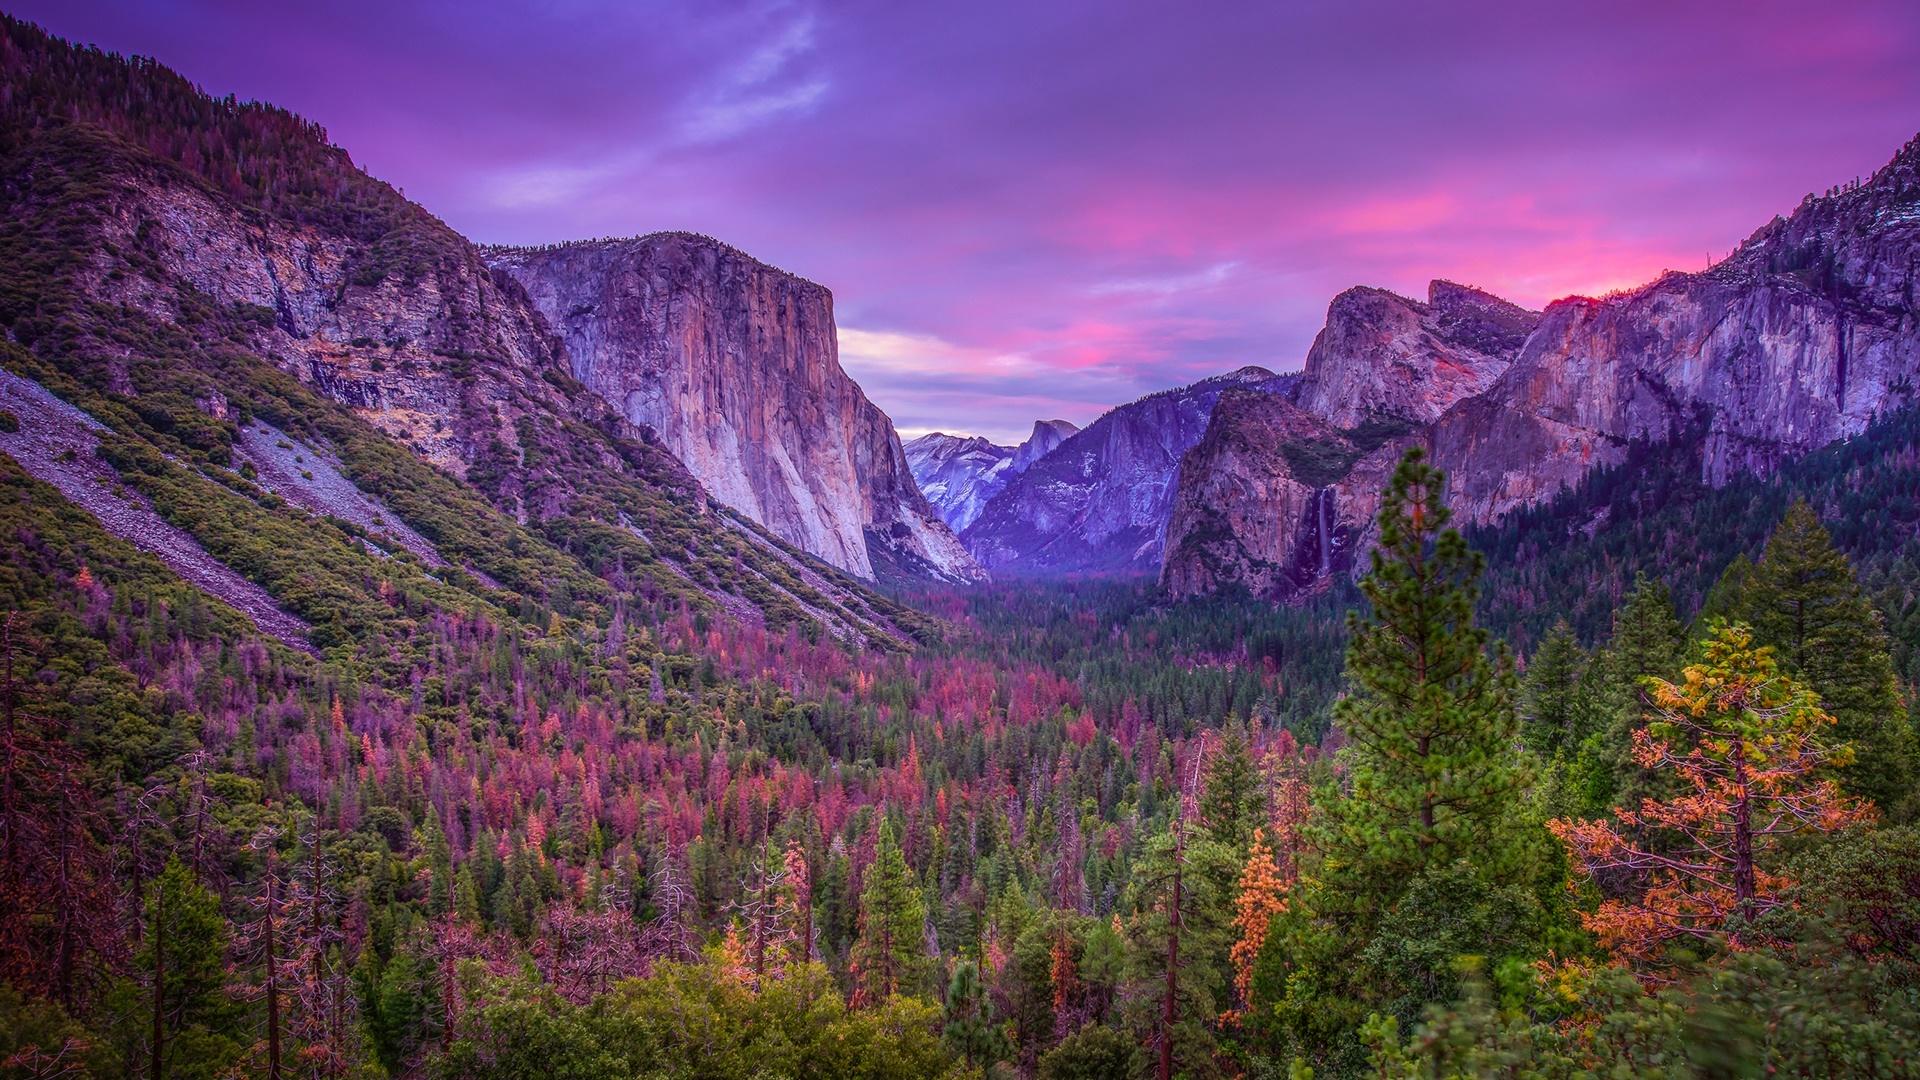 Yosemite Valley purple landscape wallpaper